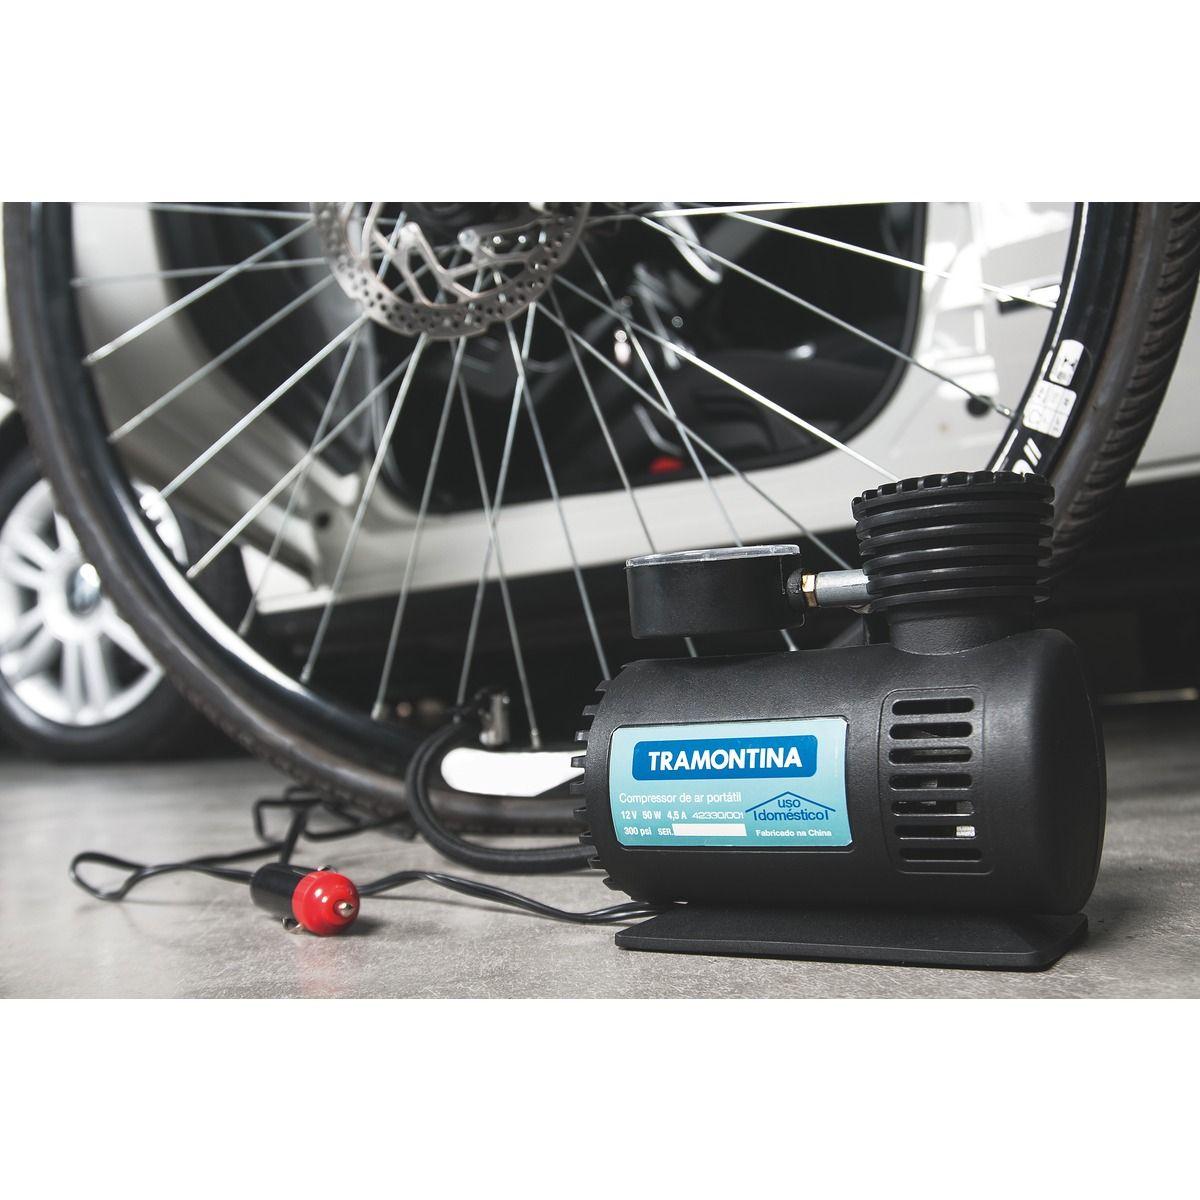 Mini Compressor Ar Automotivo Portátil 300psi 12v Tramontina